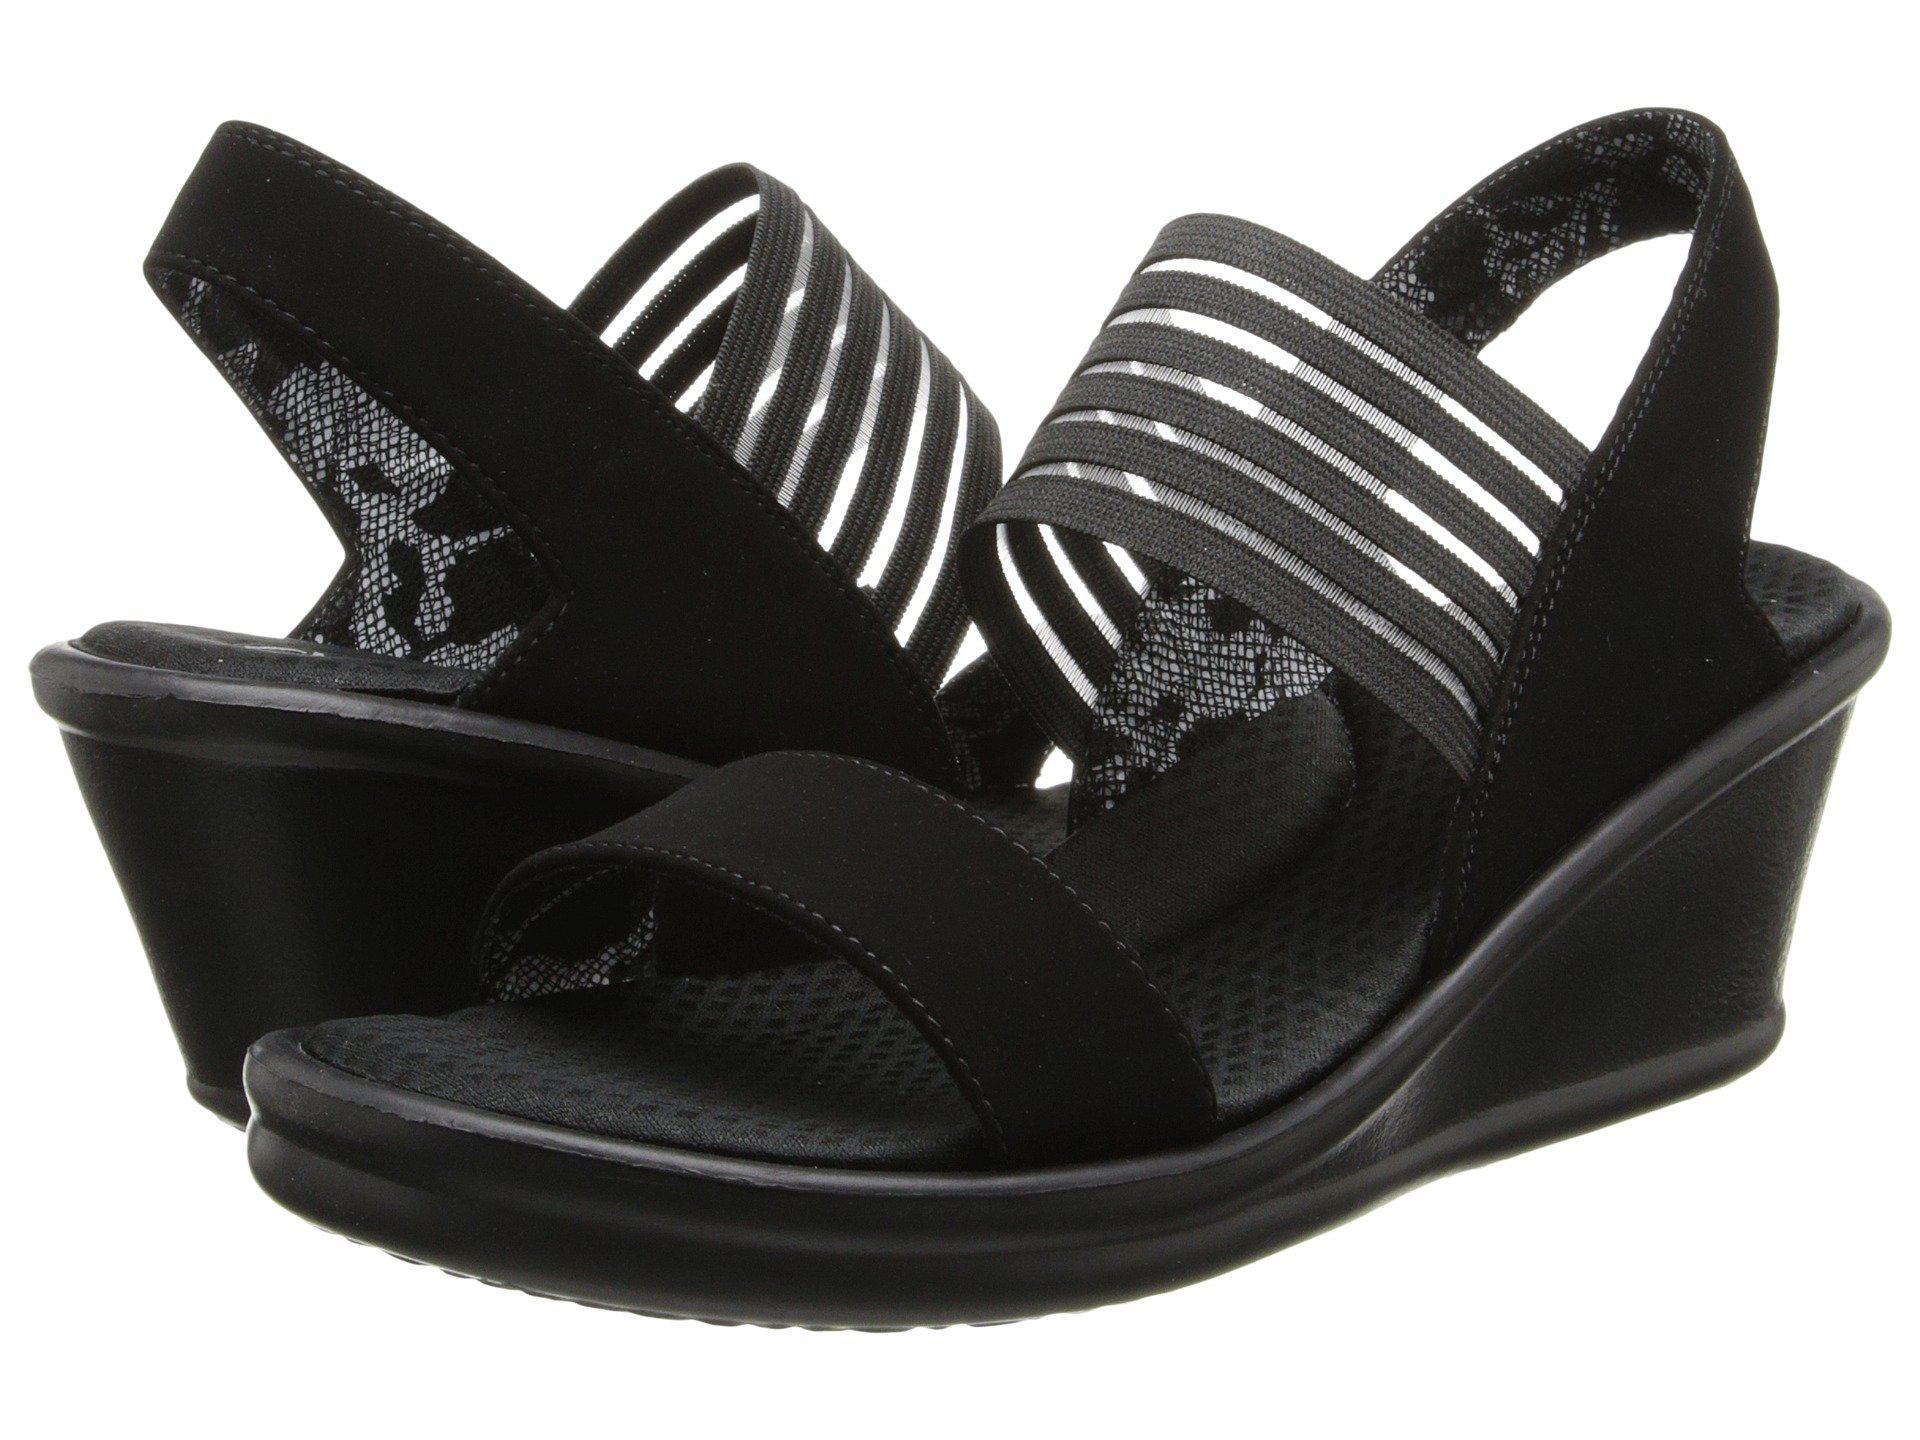 2bfb4bb4c177 Lyst - Skechers Rumblers-sci-fi (black) Women s Sandals in Black ...